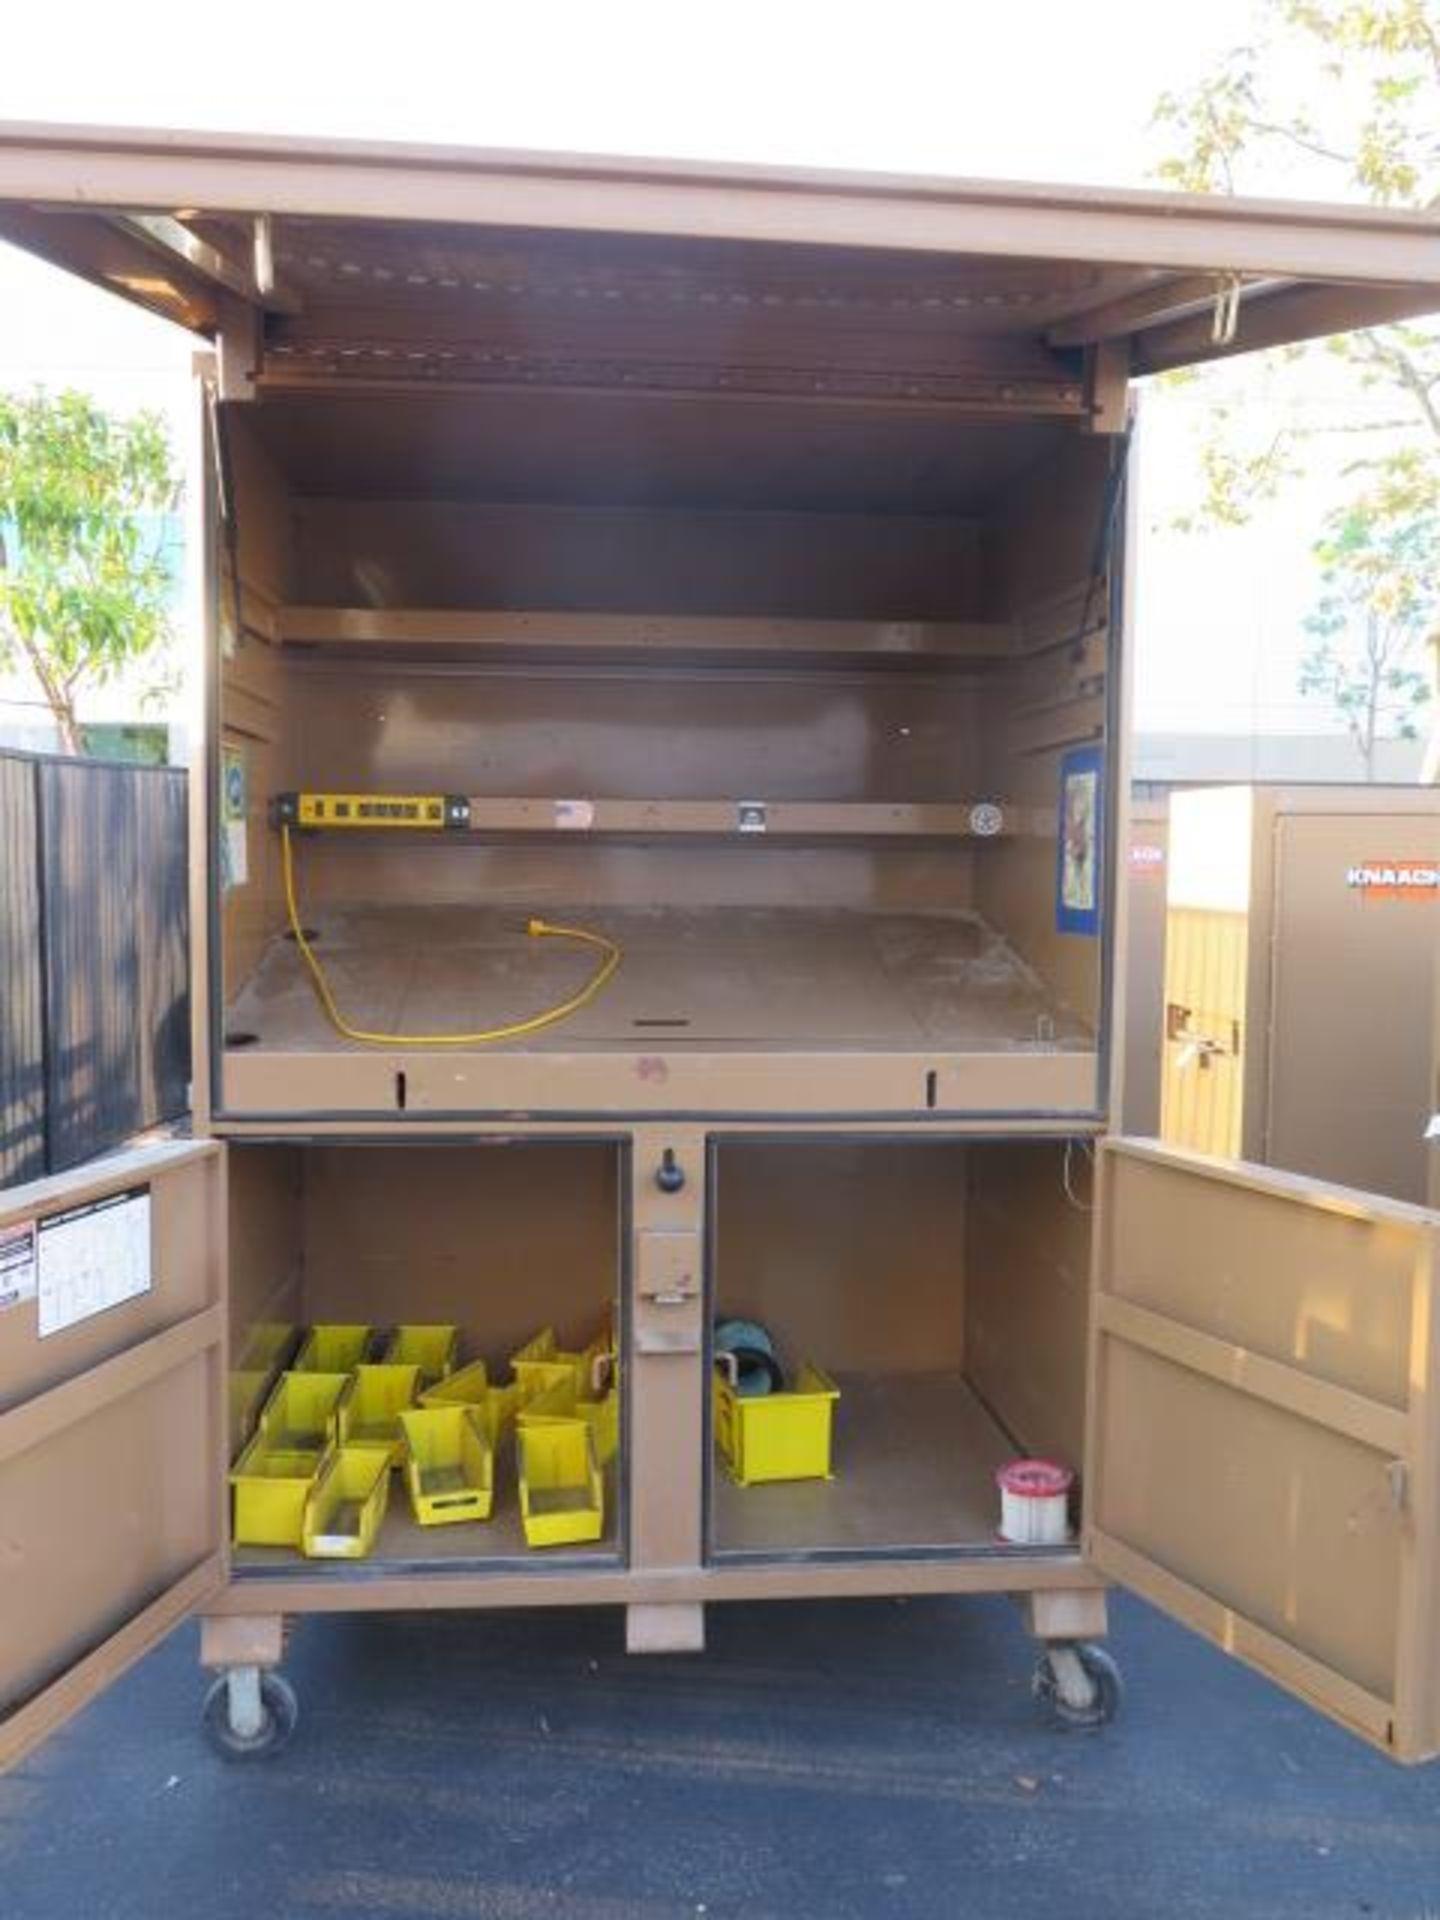 Knaack mdl. 119-01 Rolling Job Box (SOLD AS-IS - NO WARRANTY) - Image 3 of 7